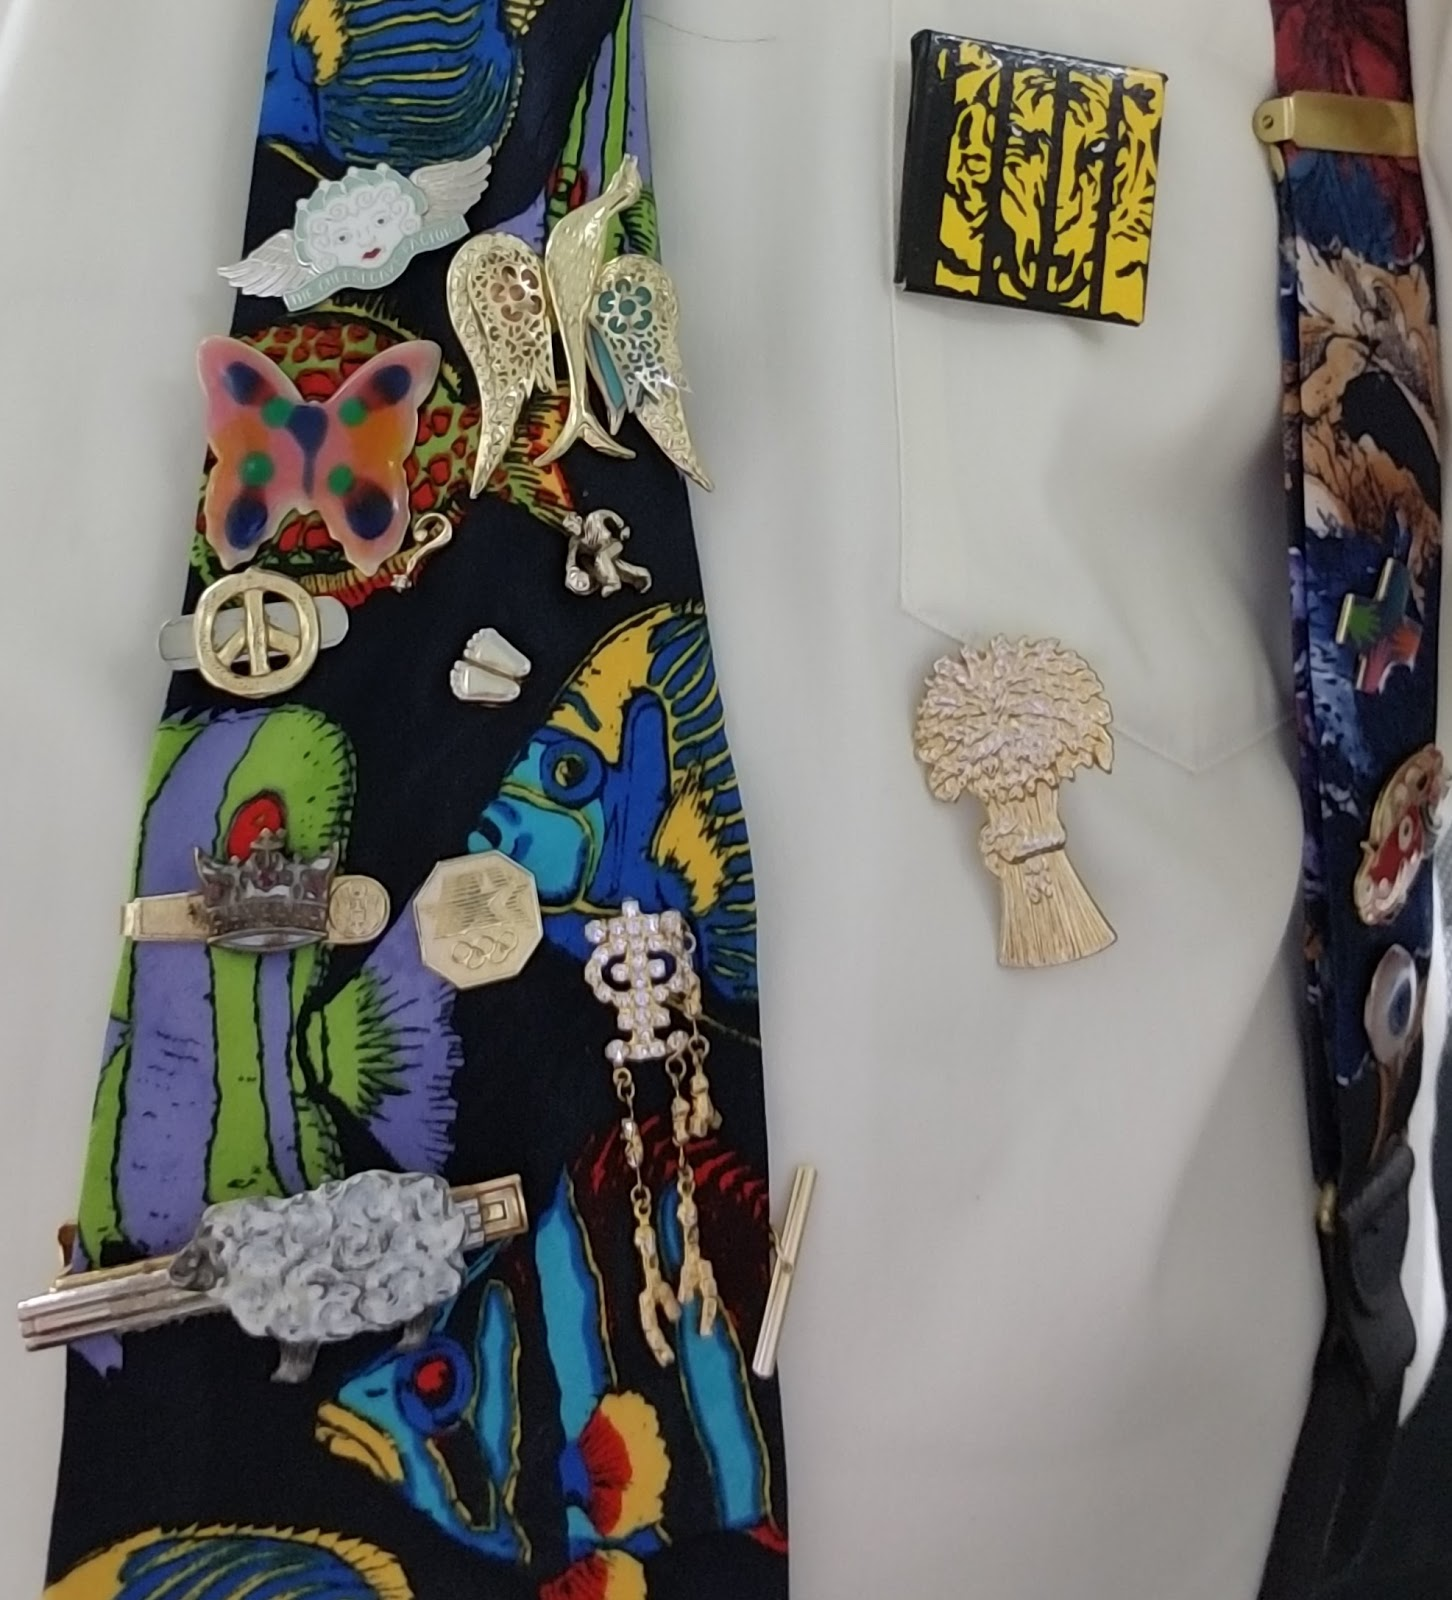 Sadducees Clothing